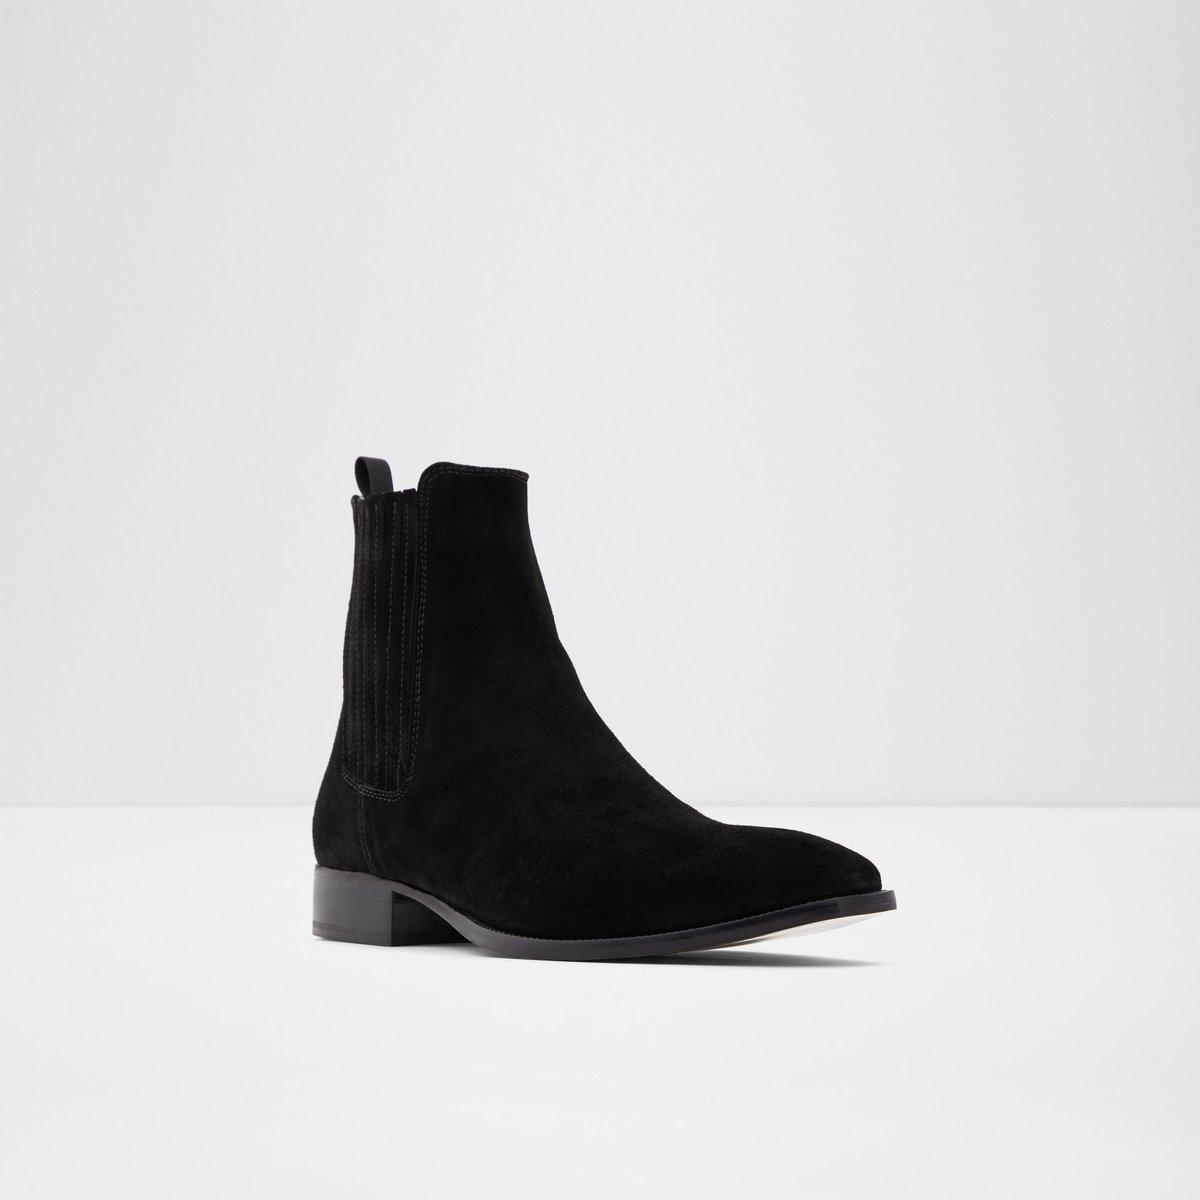 Agriracien Black Men's Casual boots